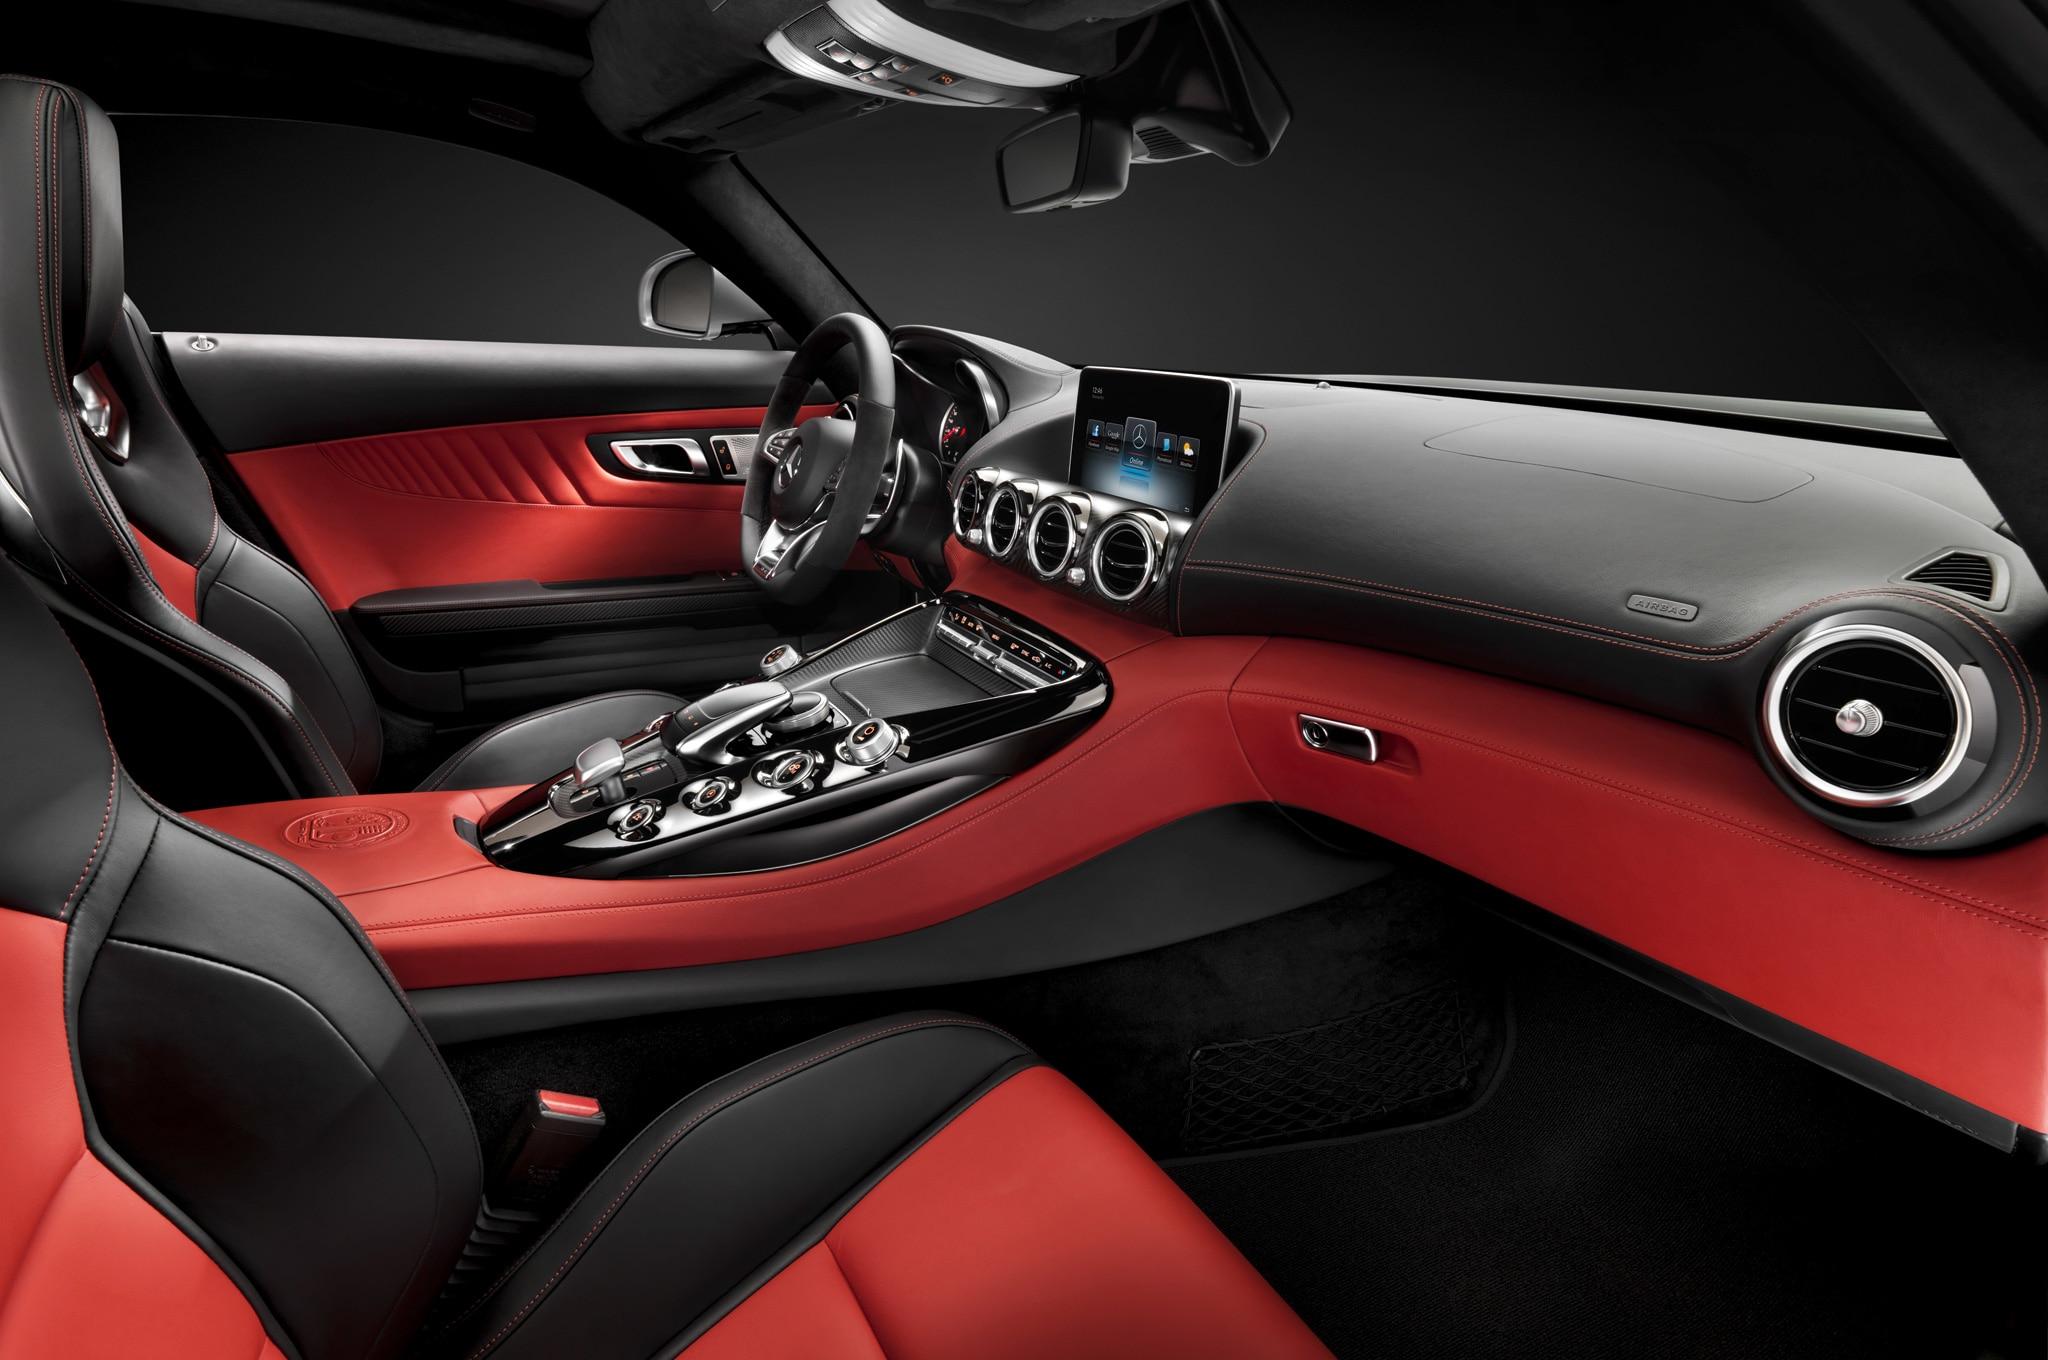 Mercedes Benz AMG GT Interior From Passenger Side